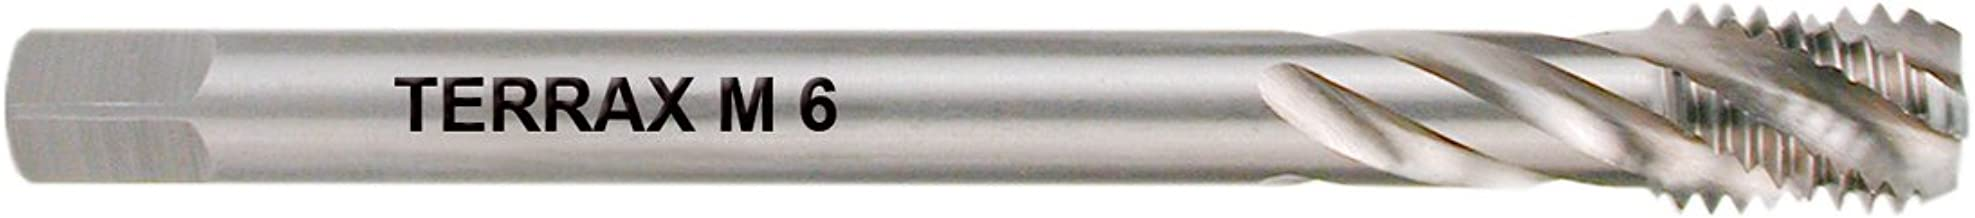 M12 HSSE-Co5 inkl WSH-TOOLS Maschinen-gewindebohrer Gelbring Set 14-teilig Durchgangsloch M3 Kernlochbohrern